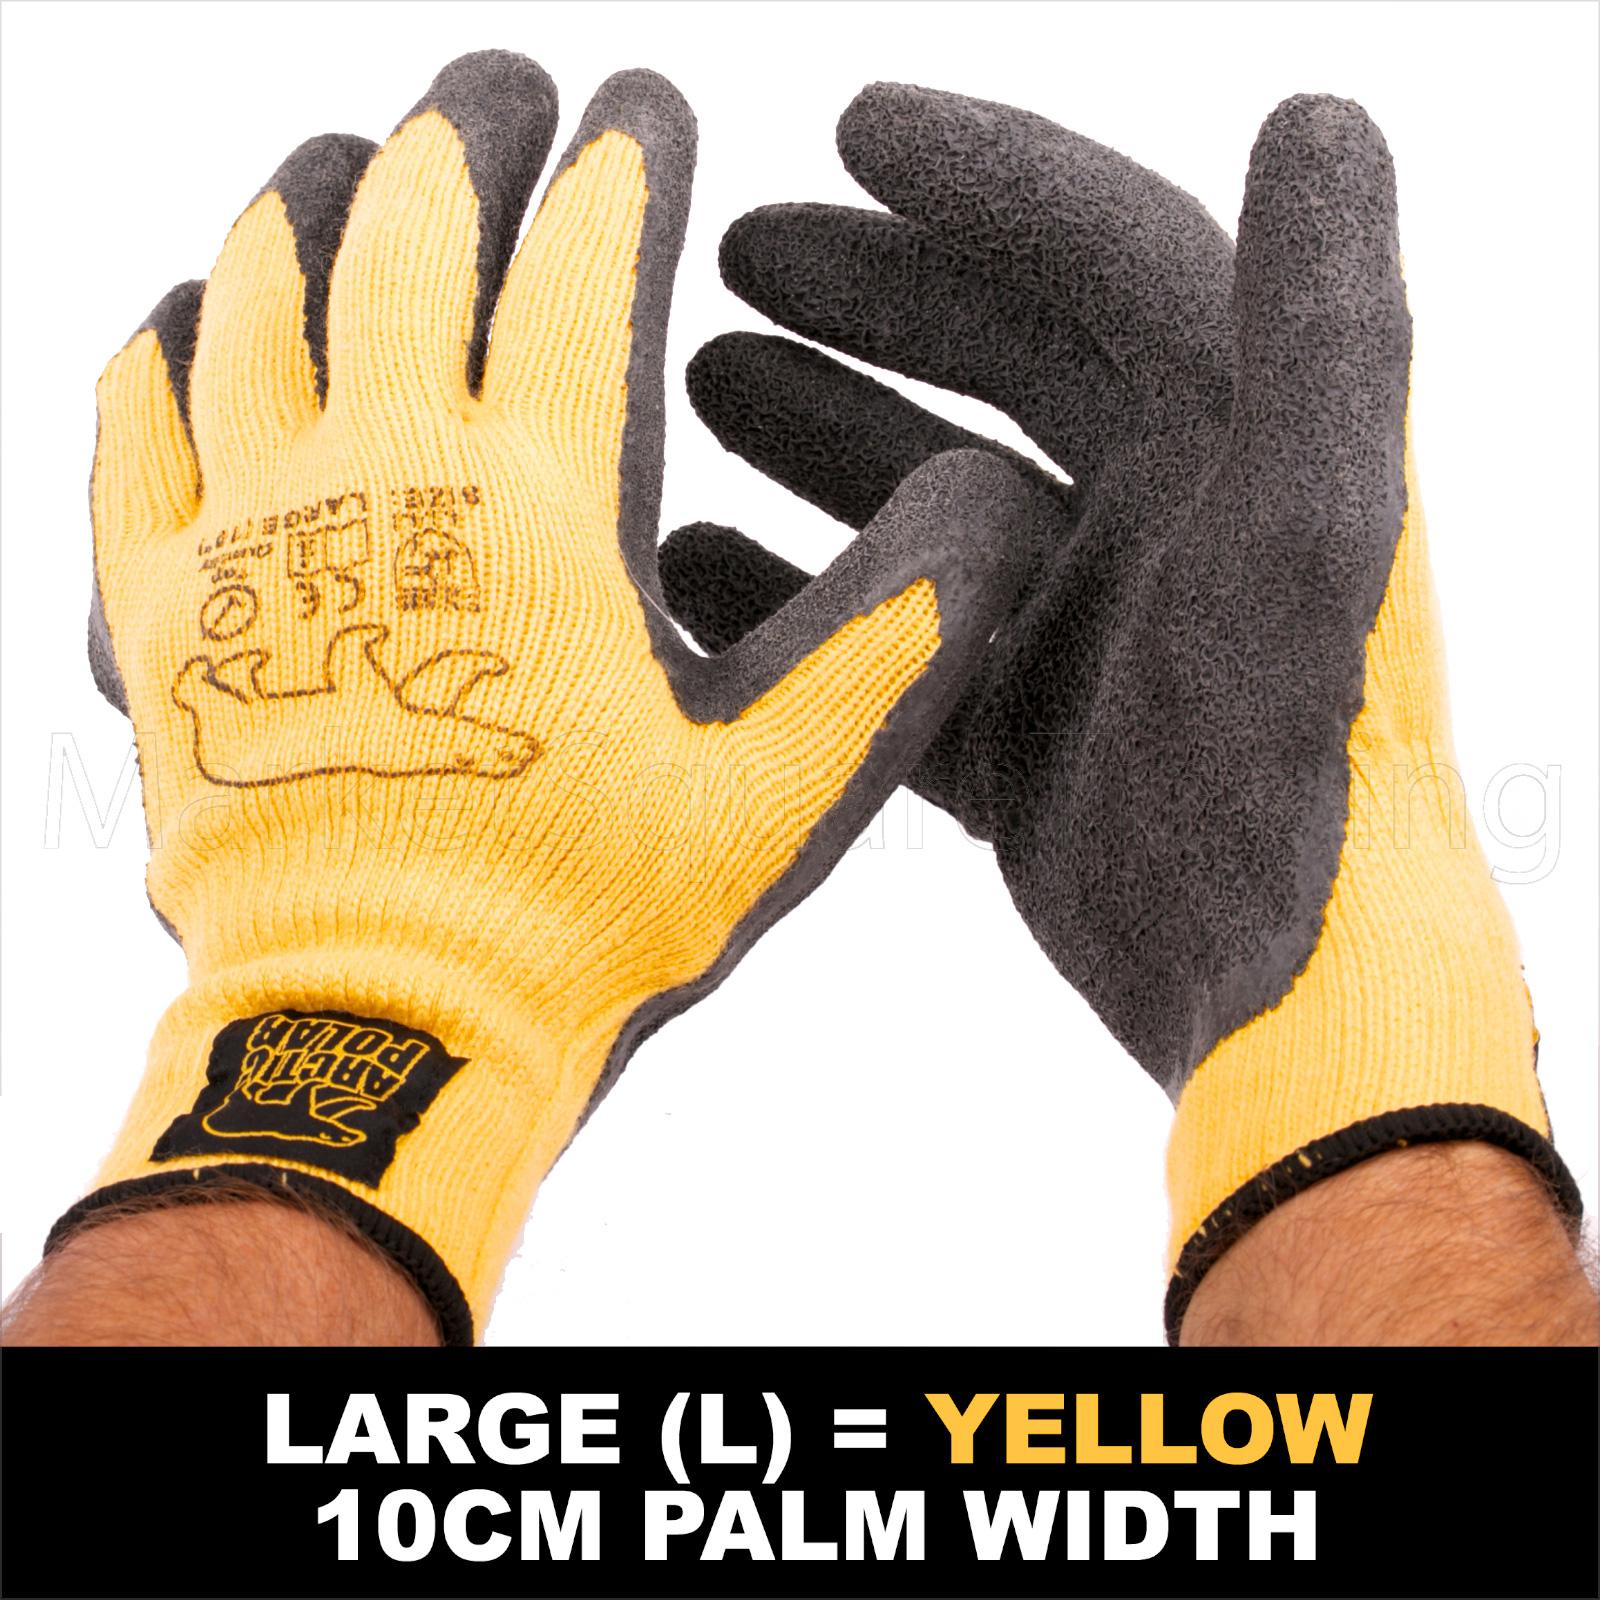 6 Pairs Outdoor Working Gloves Polar Grip Work Gardening Gloves Latex Coated New